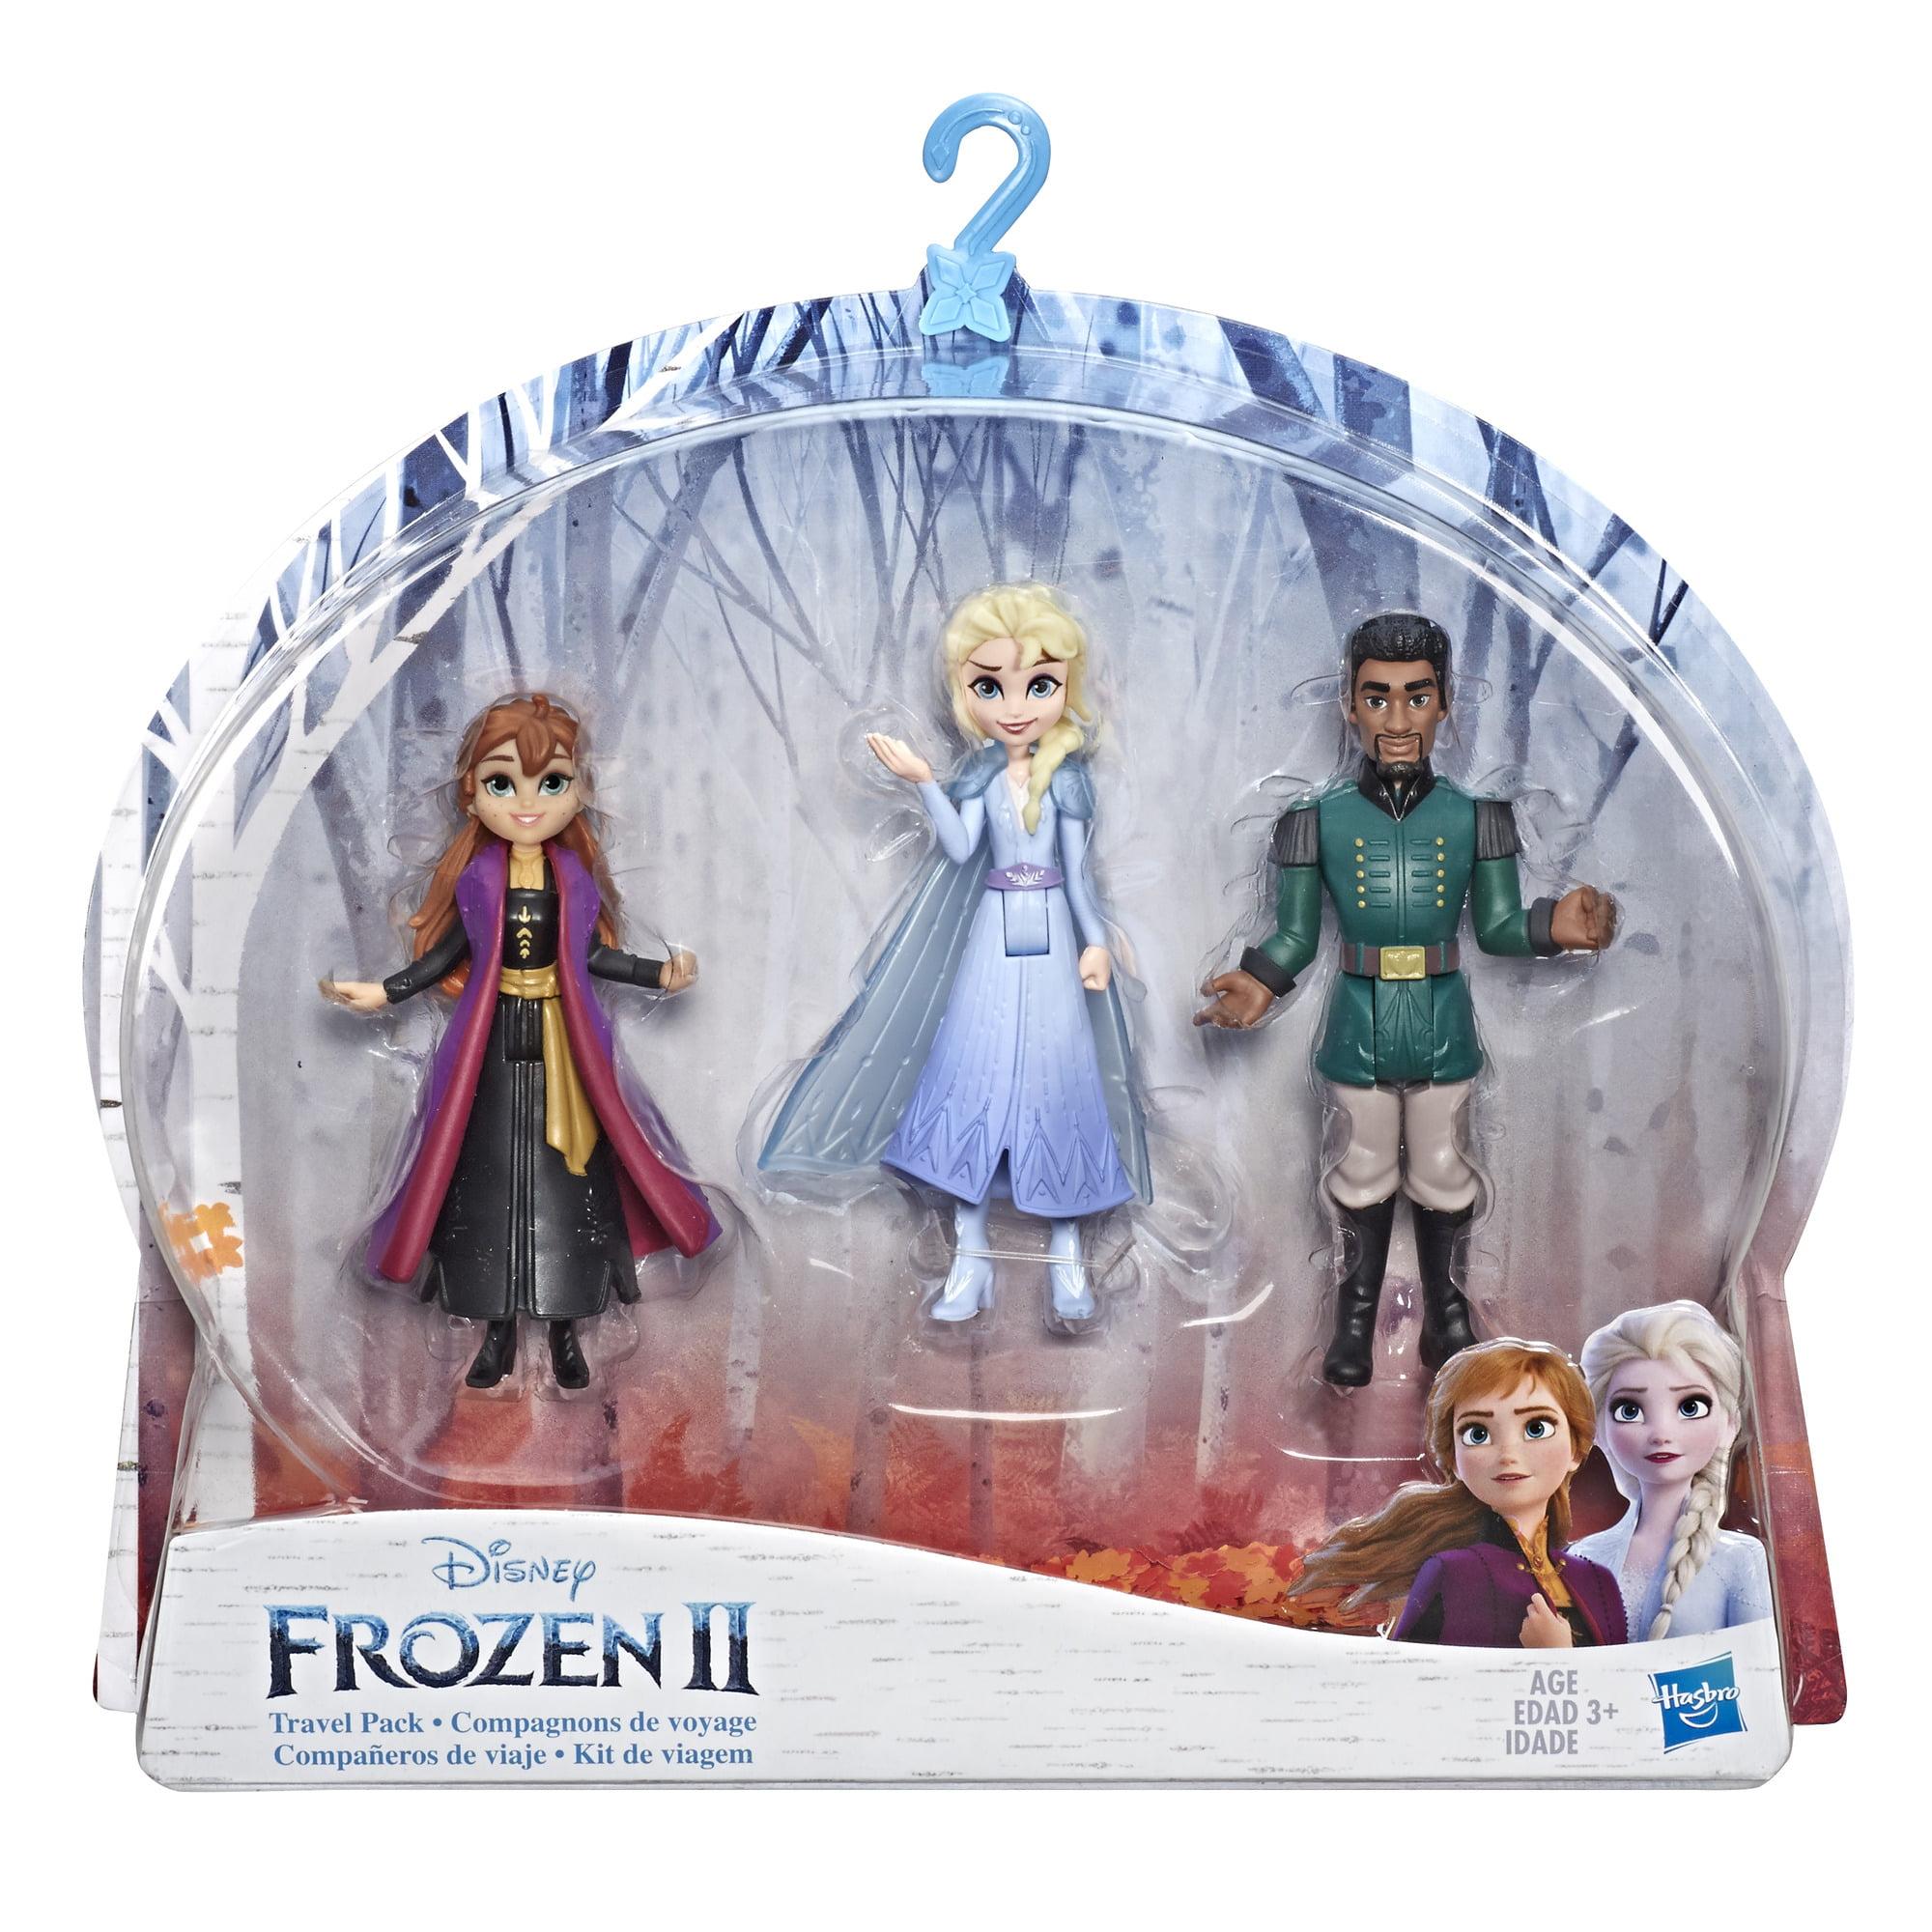 Disney Frozen 2 Small Doll Playset with Elsa, Anna & Mattias